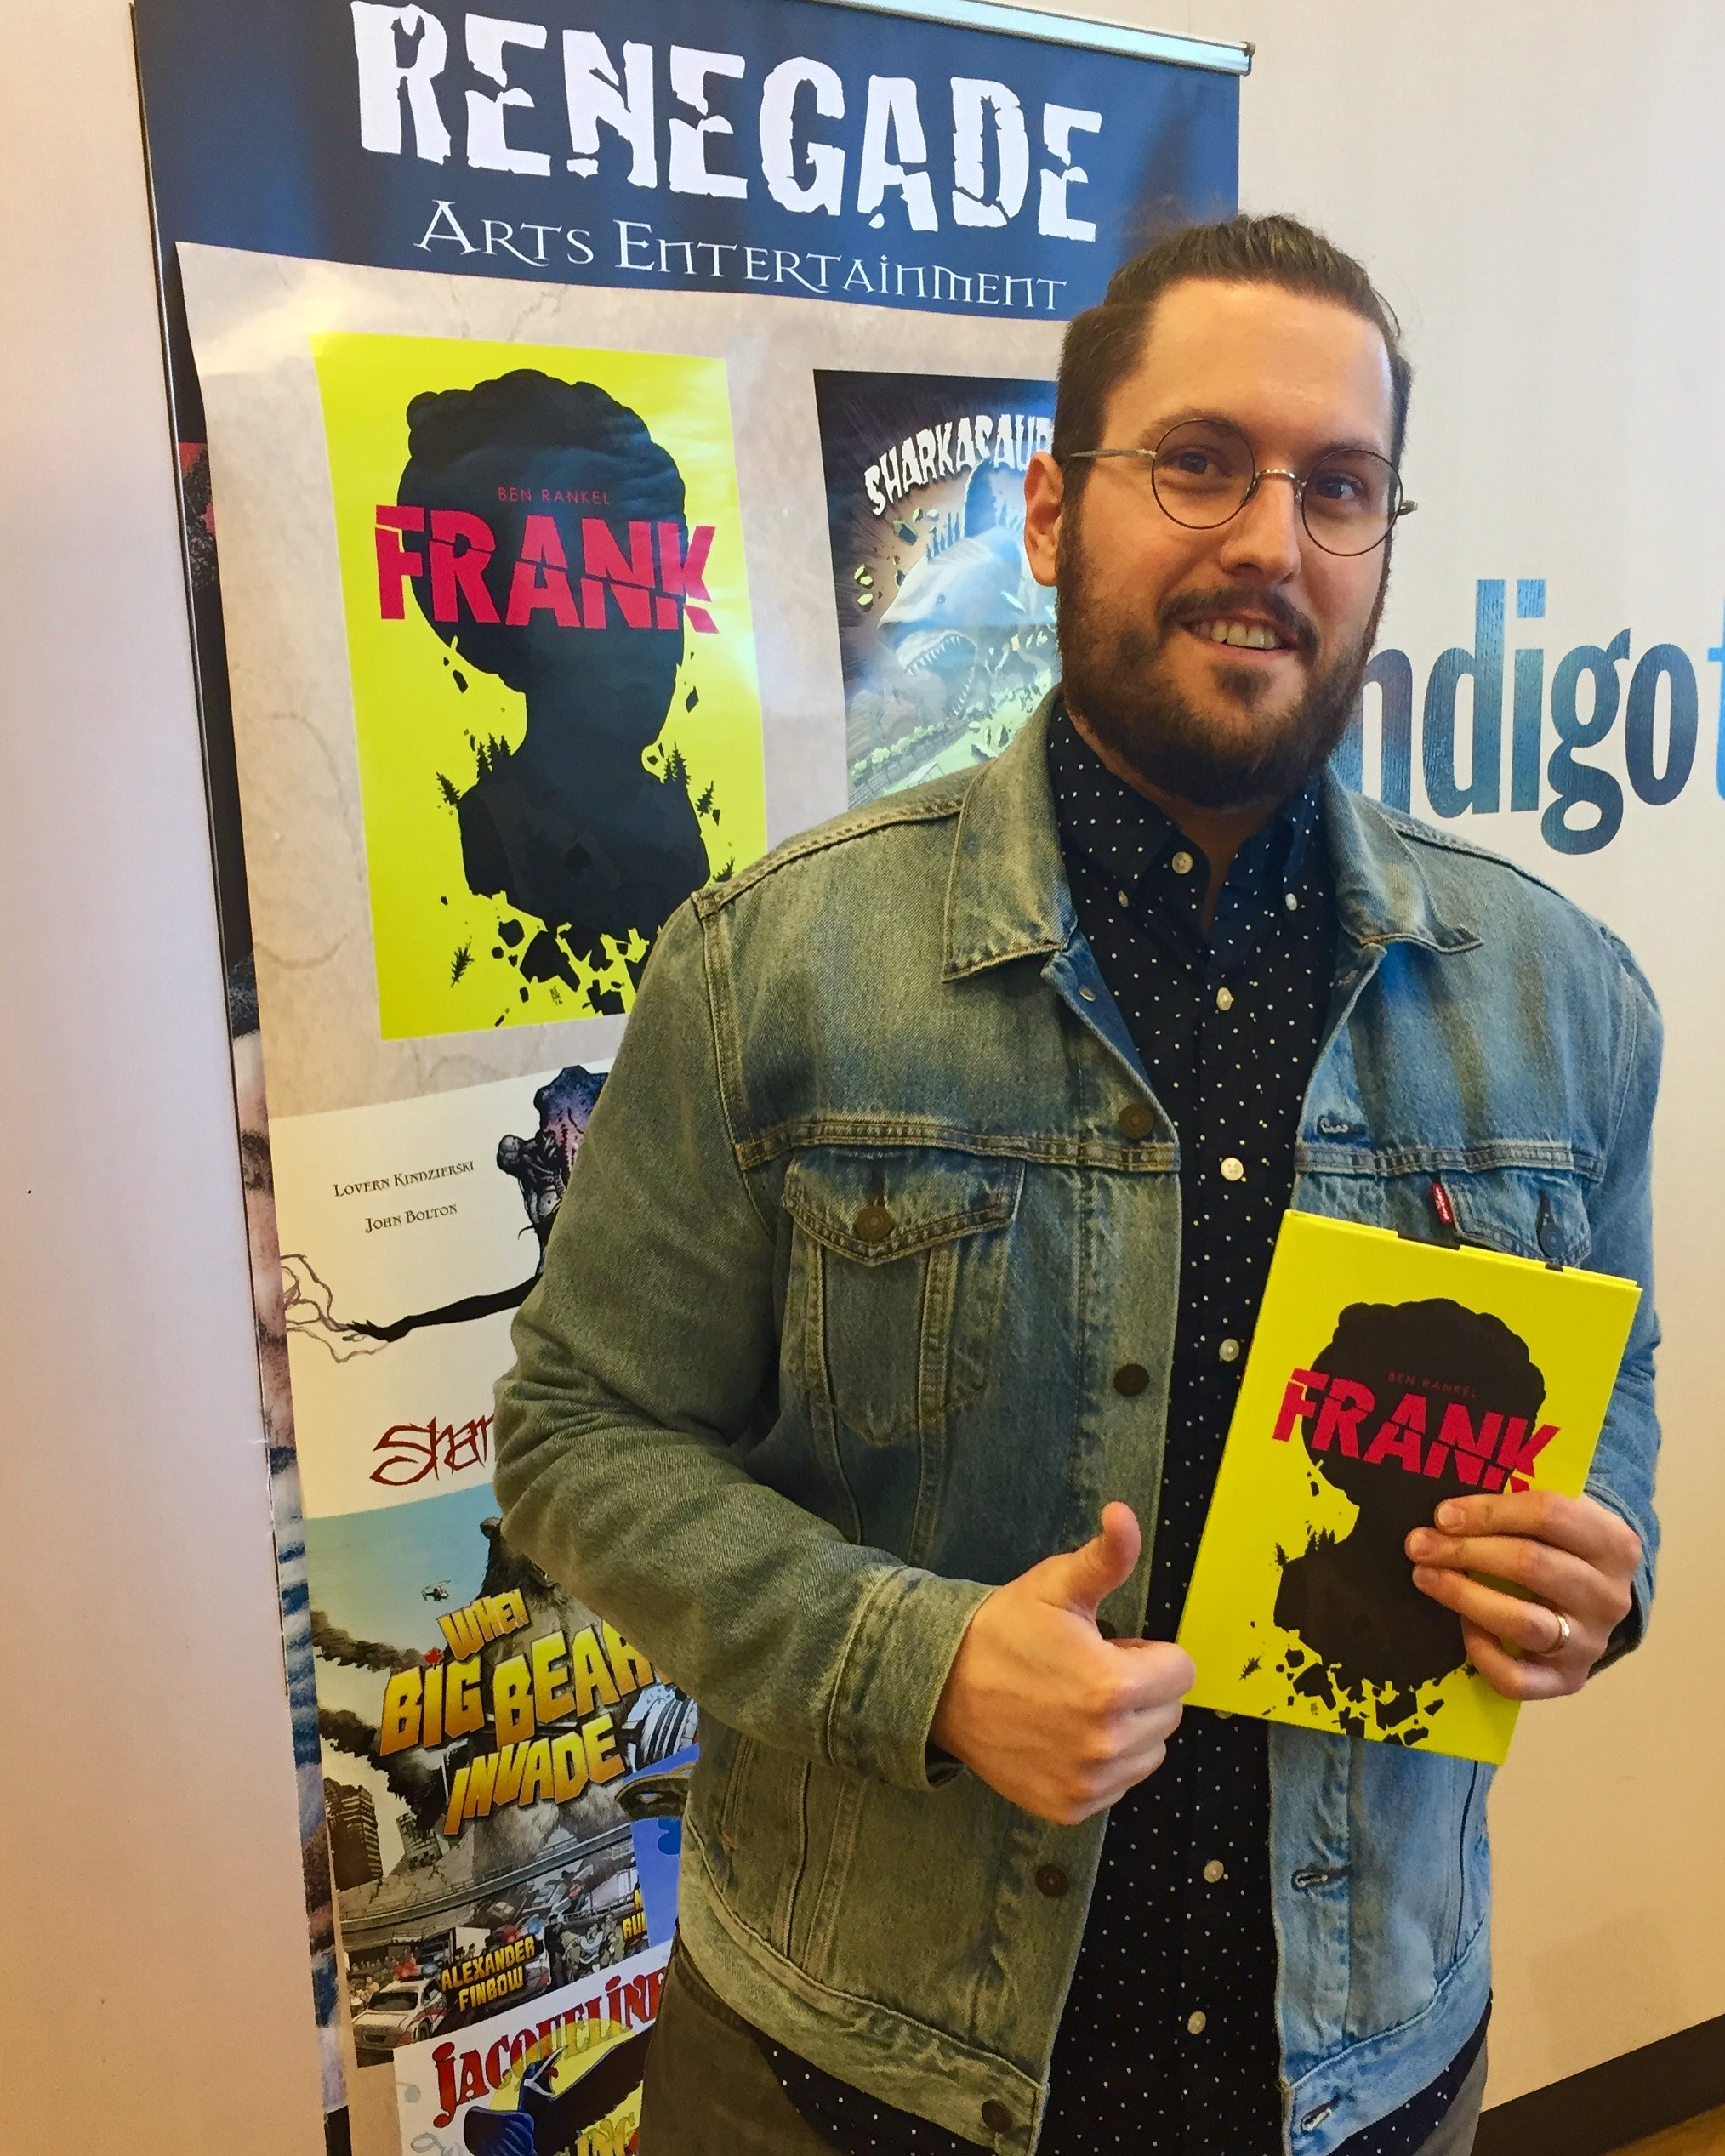 Ben Rankel, creator of FRANK, at Crowfoot Chapters on May 19, 2018.  (Photo credit: Chris Doucher for GeekNerdNet.com)